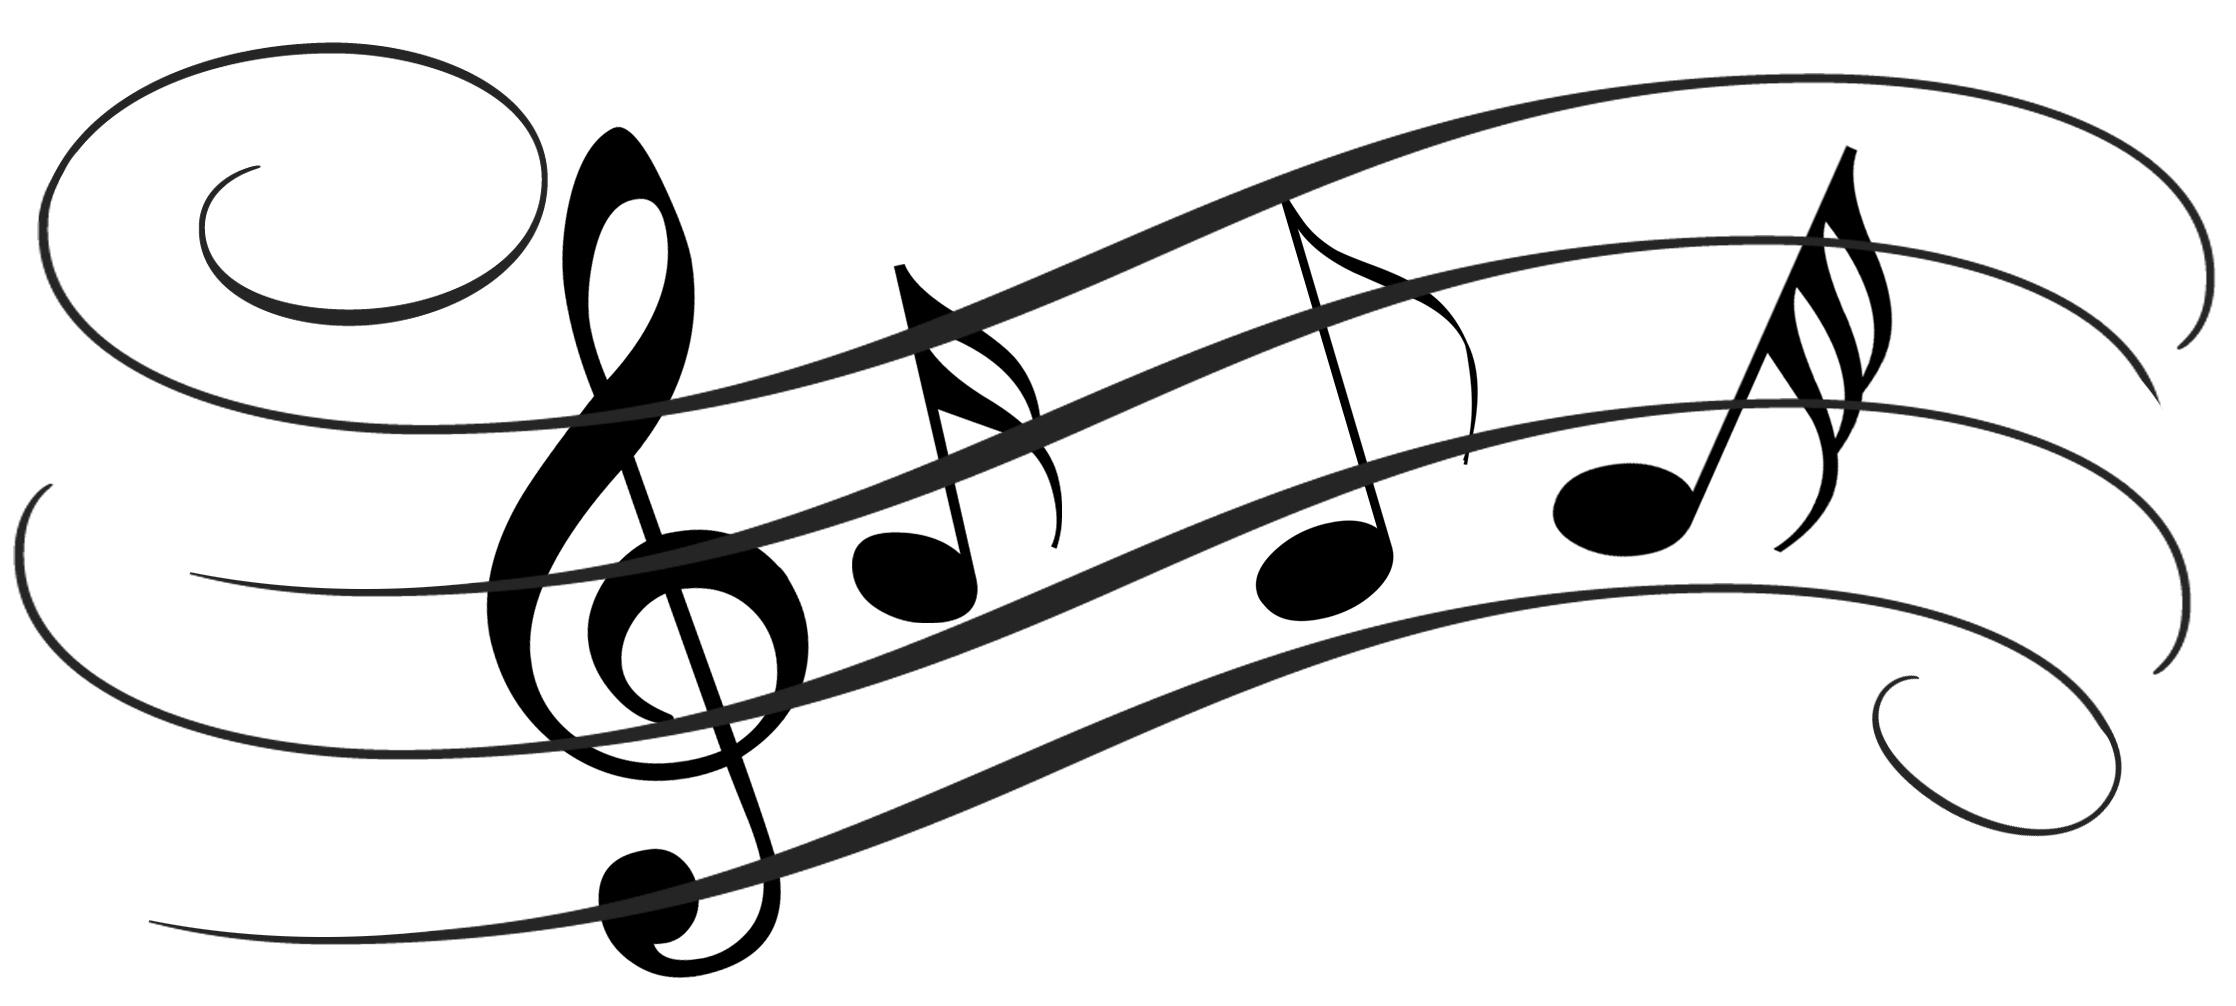 تئوری موسیقی رو بخورش:)